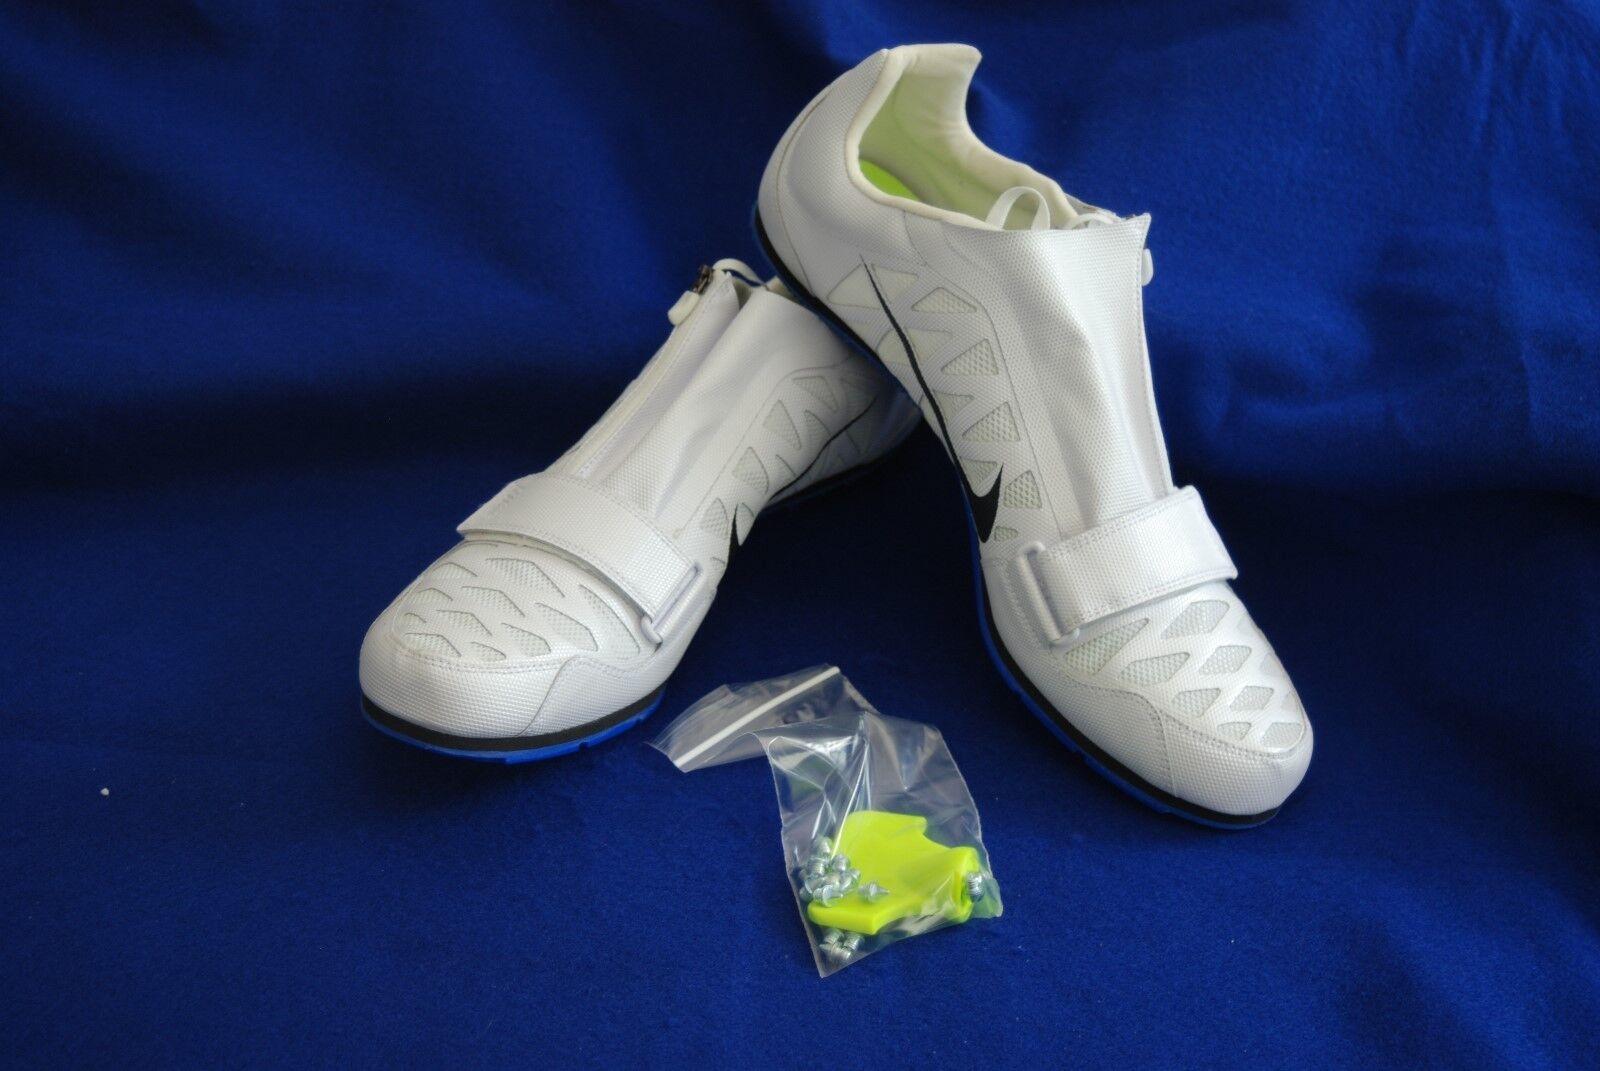 Nike Zoom LJ 4 Jump Unisex Track Spikes 415339-100 White Racer bluee Size 15